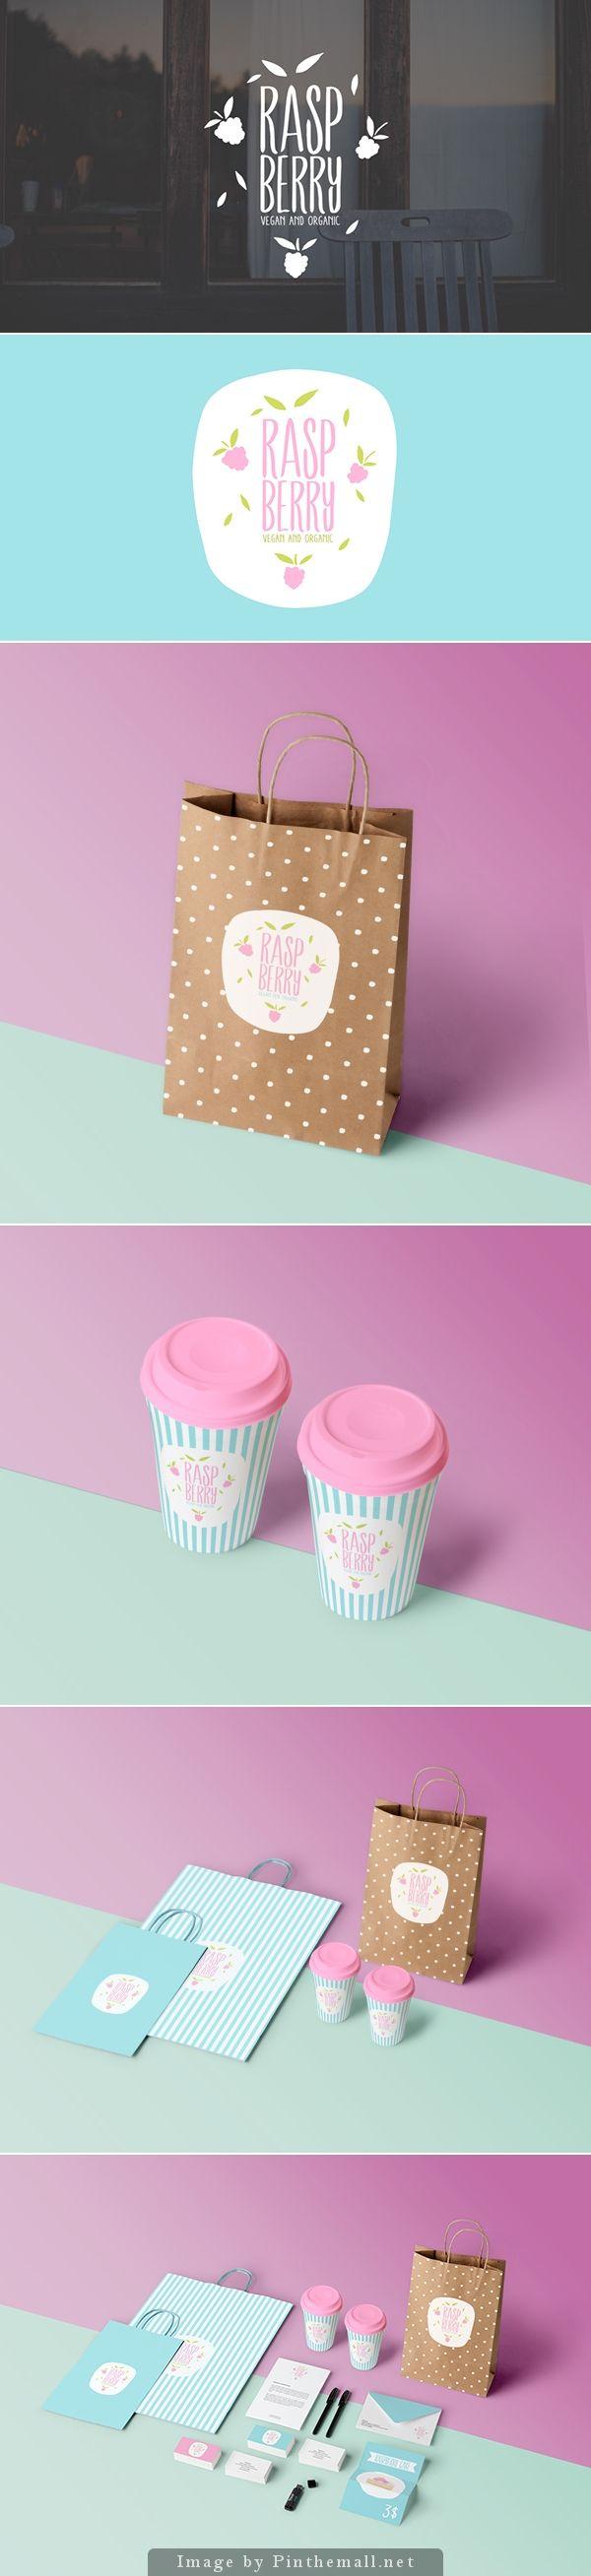 Raspberry, vegan and organic #packaging #design